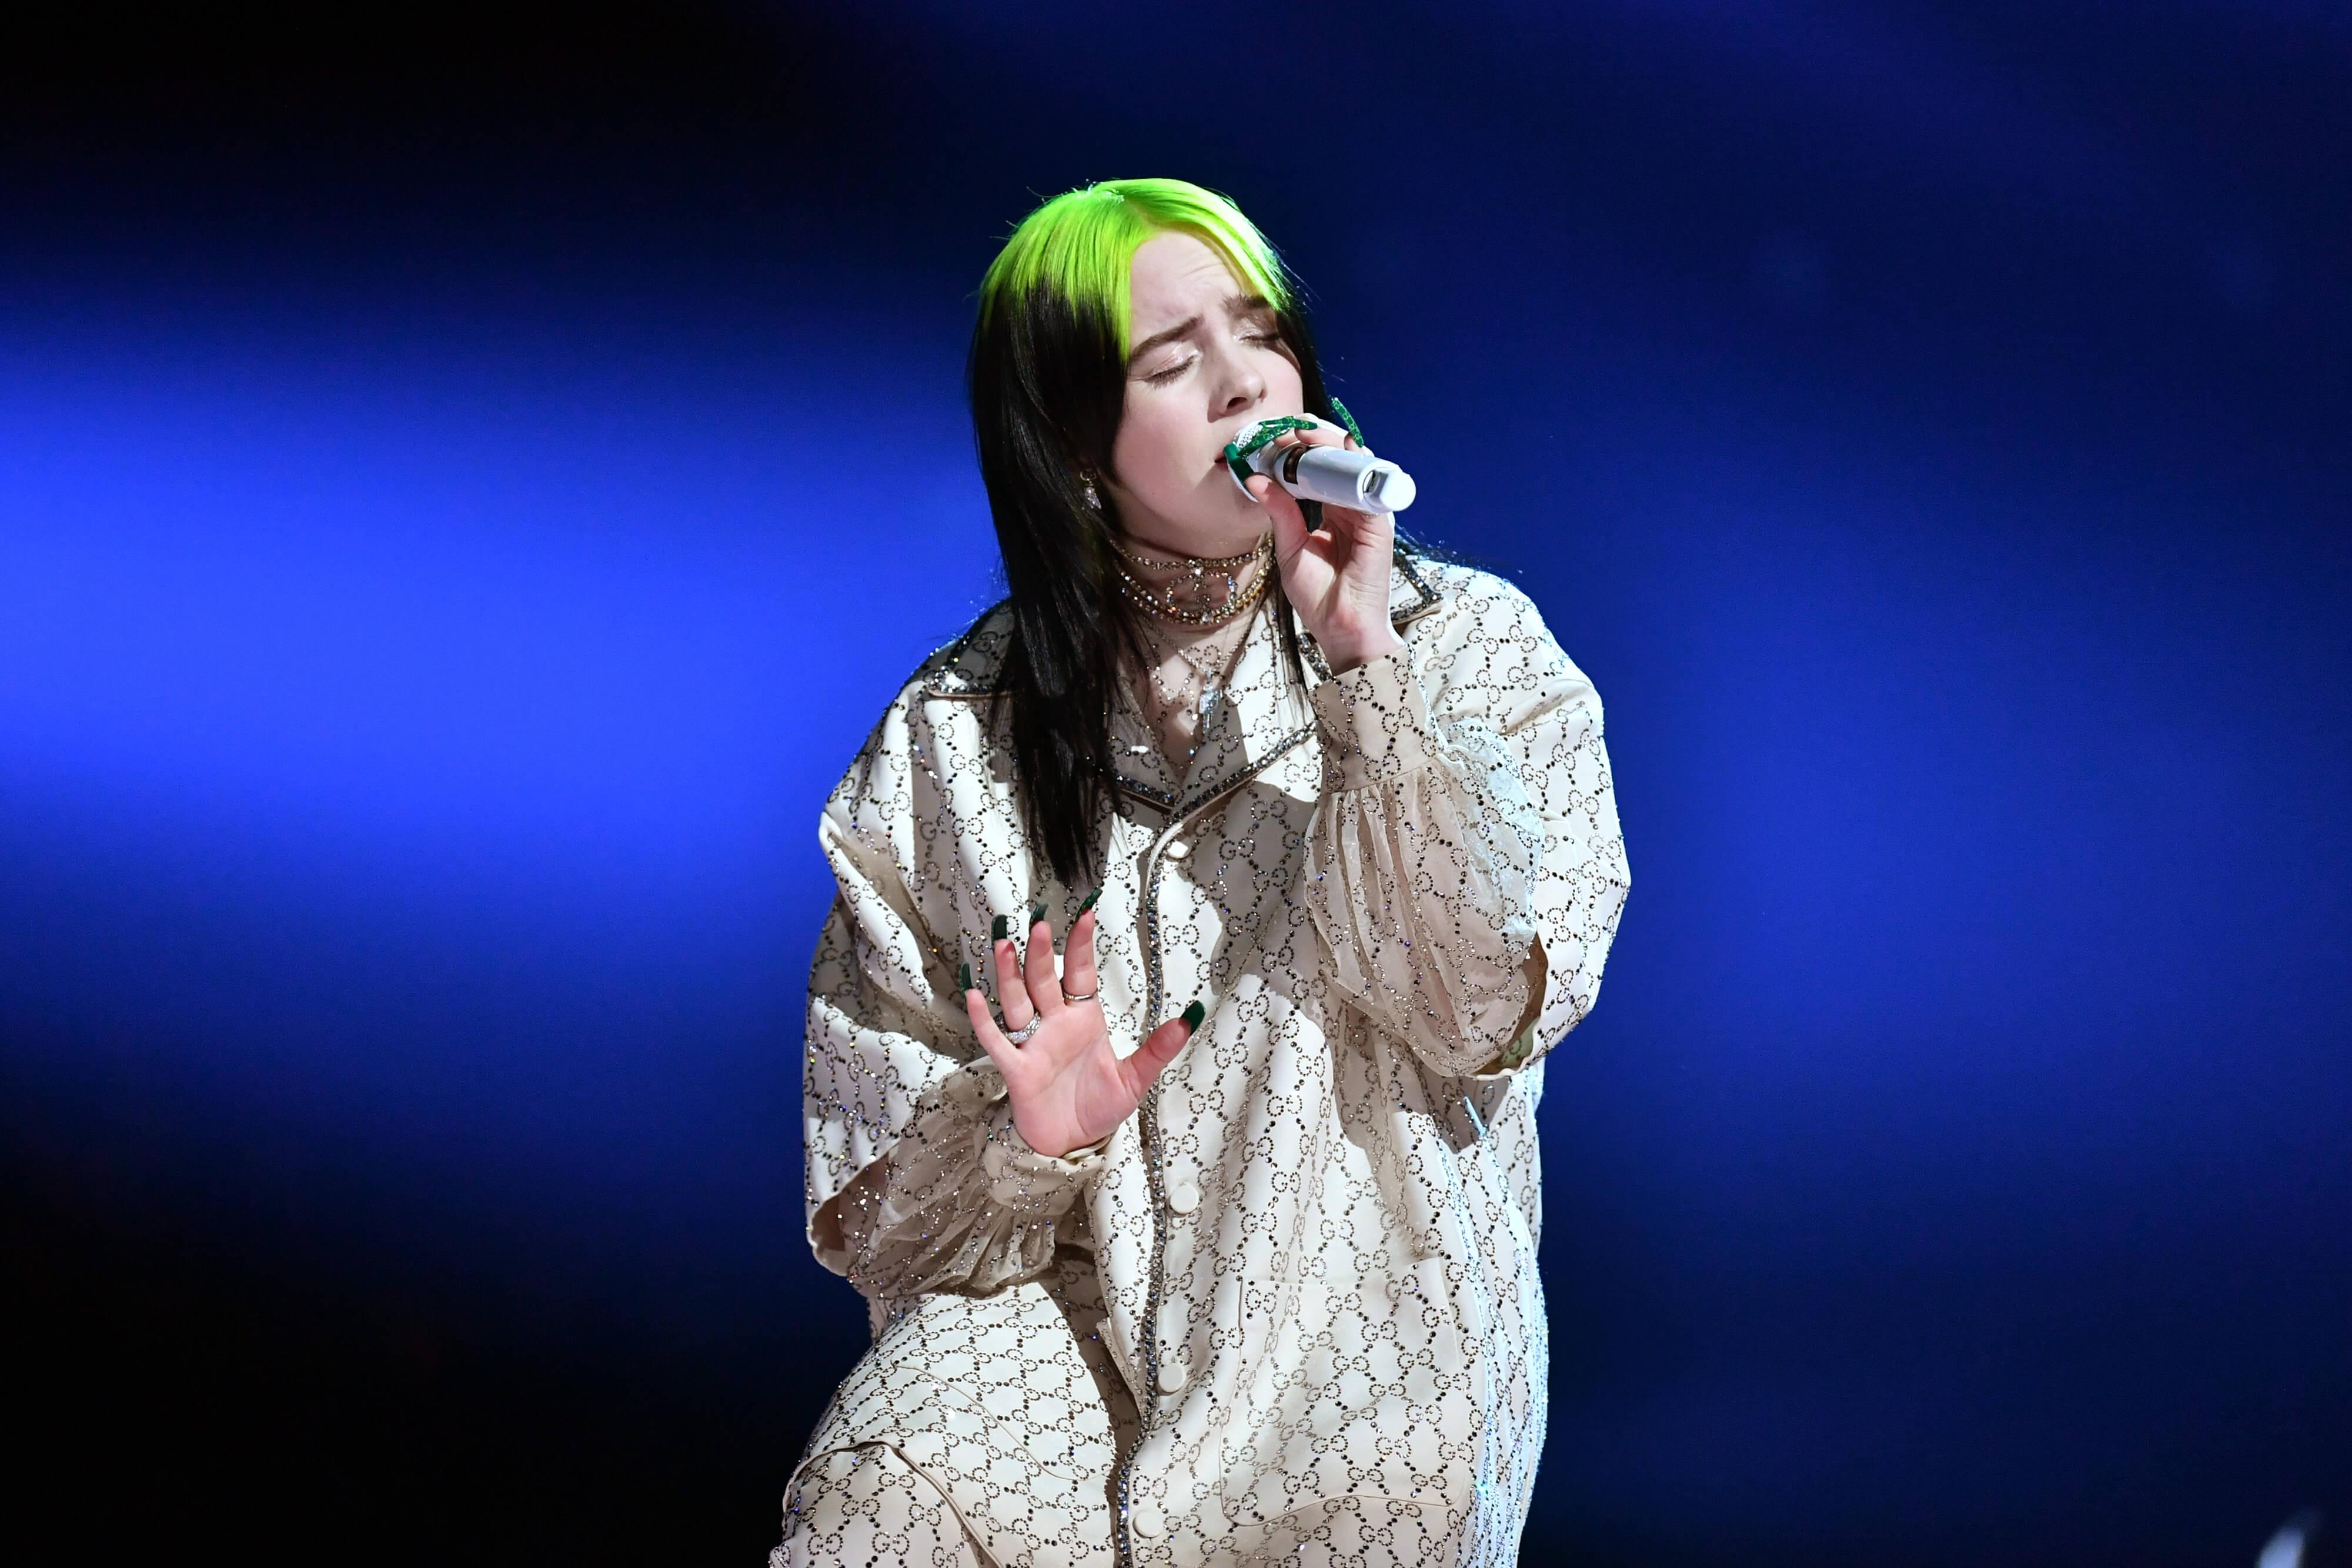 Billie Eilish Reveals More